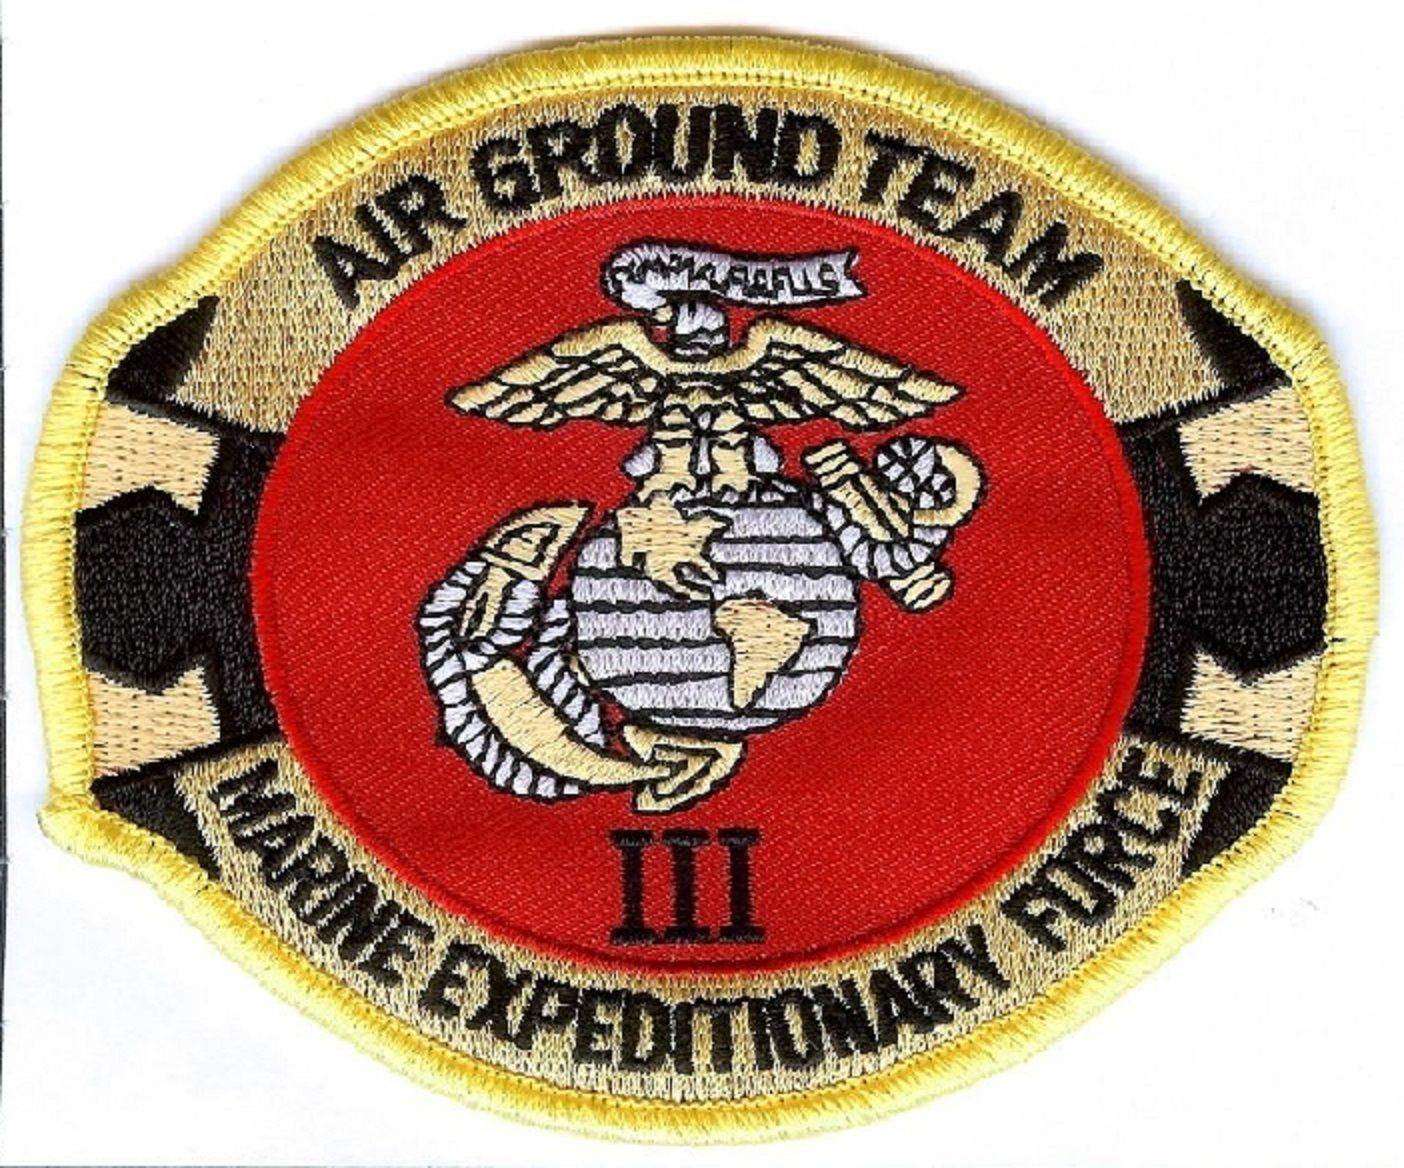 USMC 3rd Marine Expeditionary Force PATCH III MEF Air Ground Team 3d MEF - $1,000.00